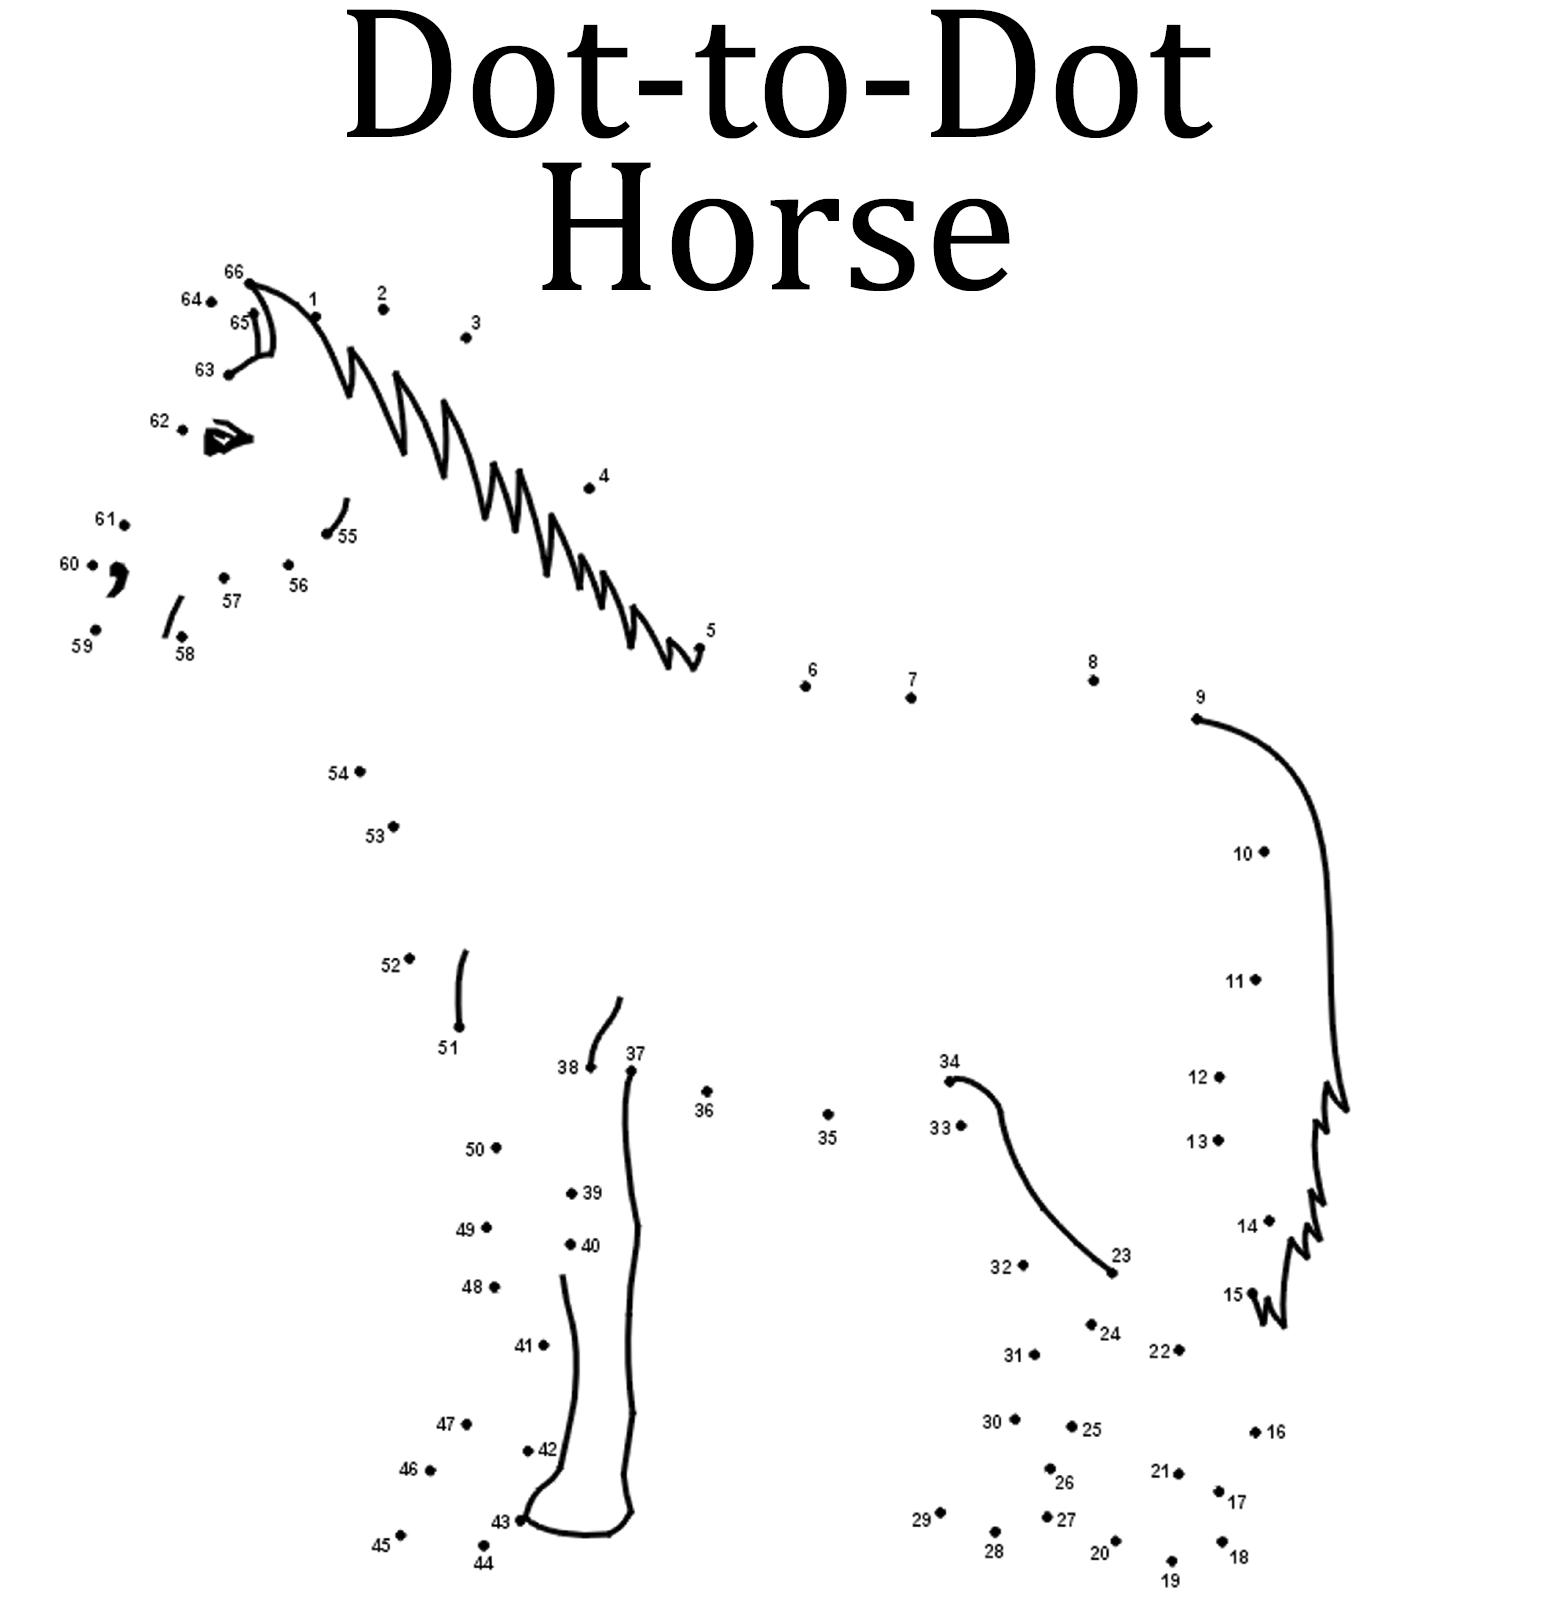 Dot-to-Dot Horse